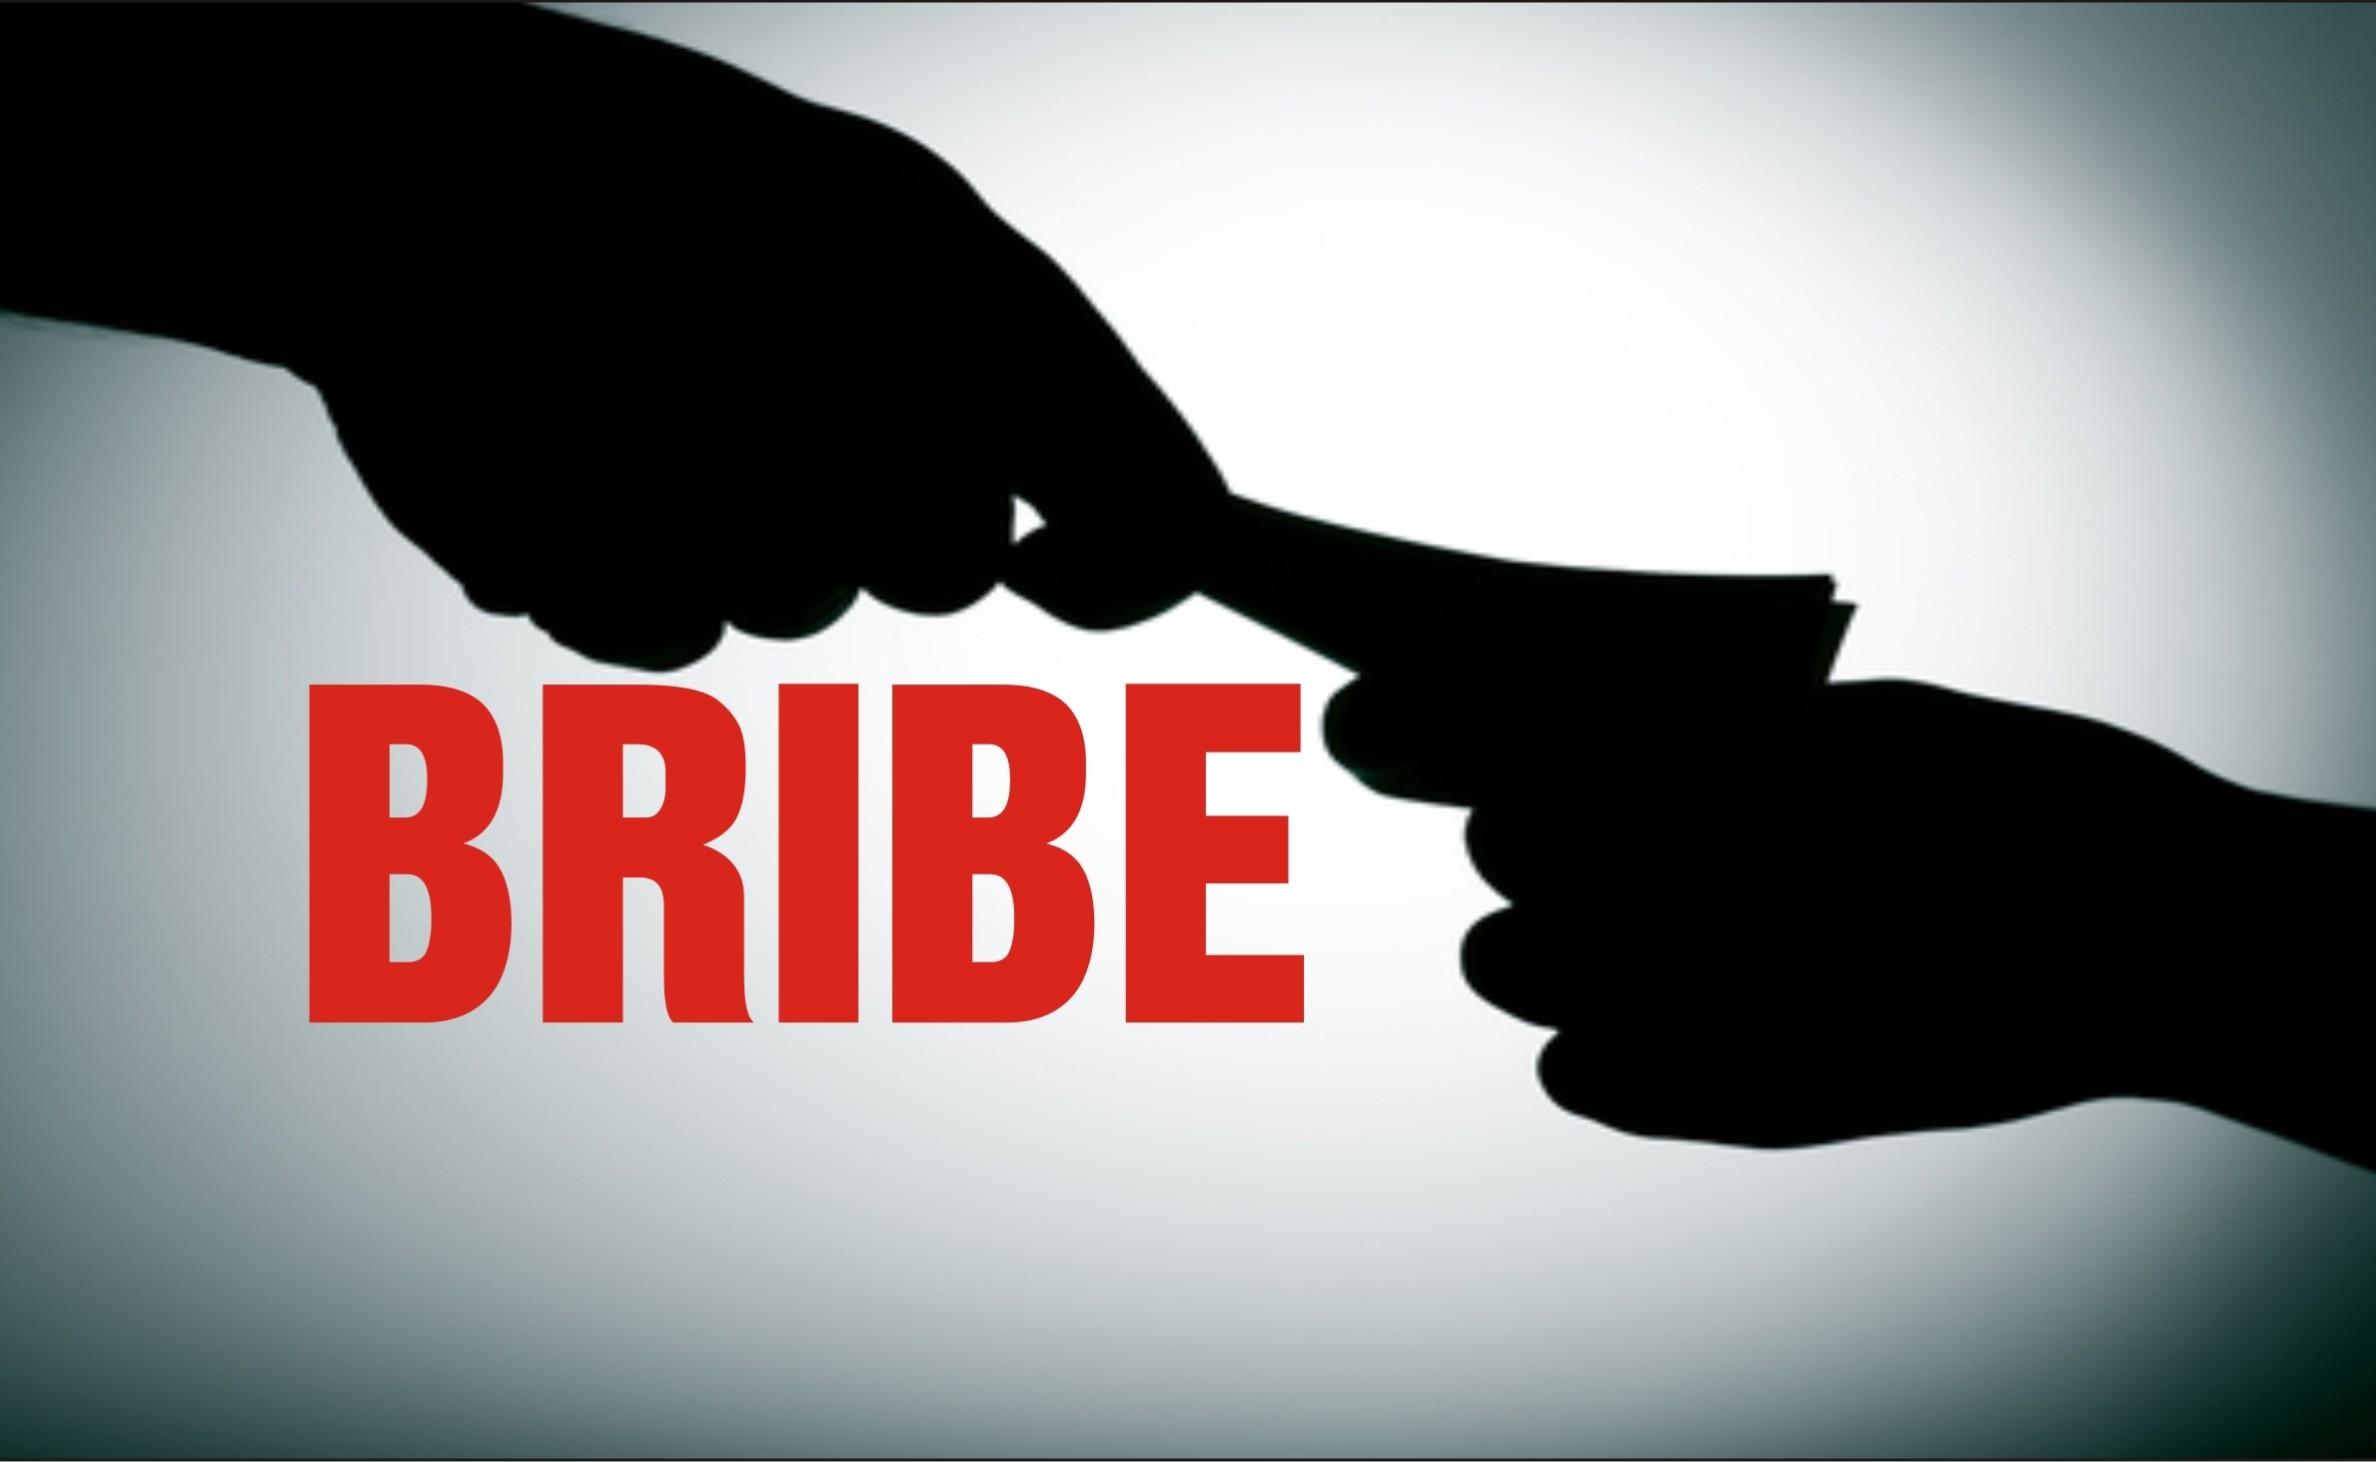 Bribe e1461928392461 - 2015 Campaign Fund: EFCC arraigns fresh 11 INEC staff over N120m